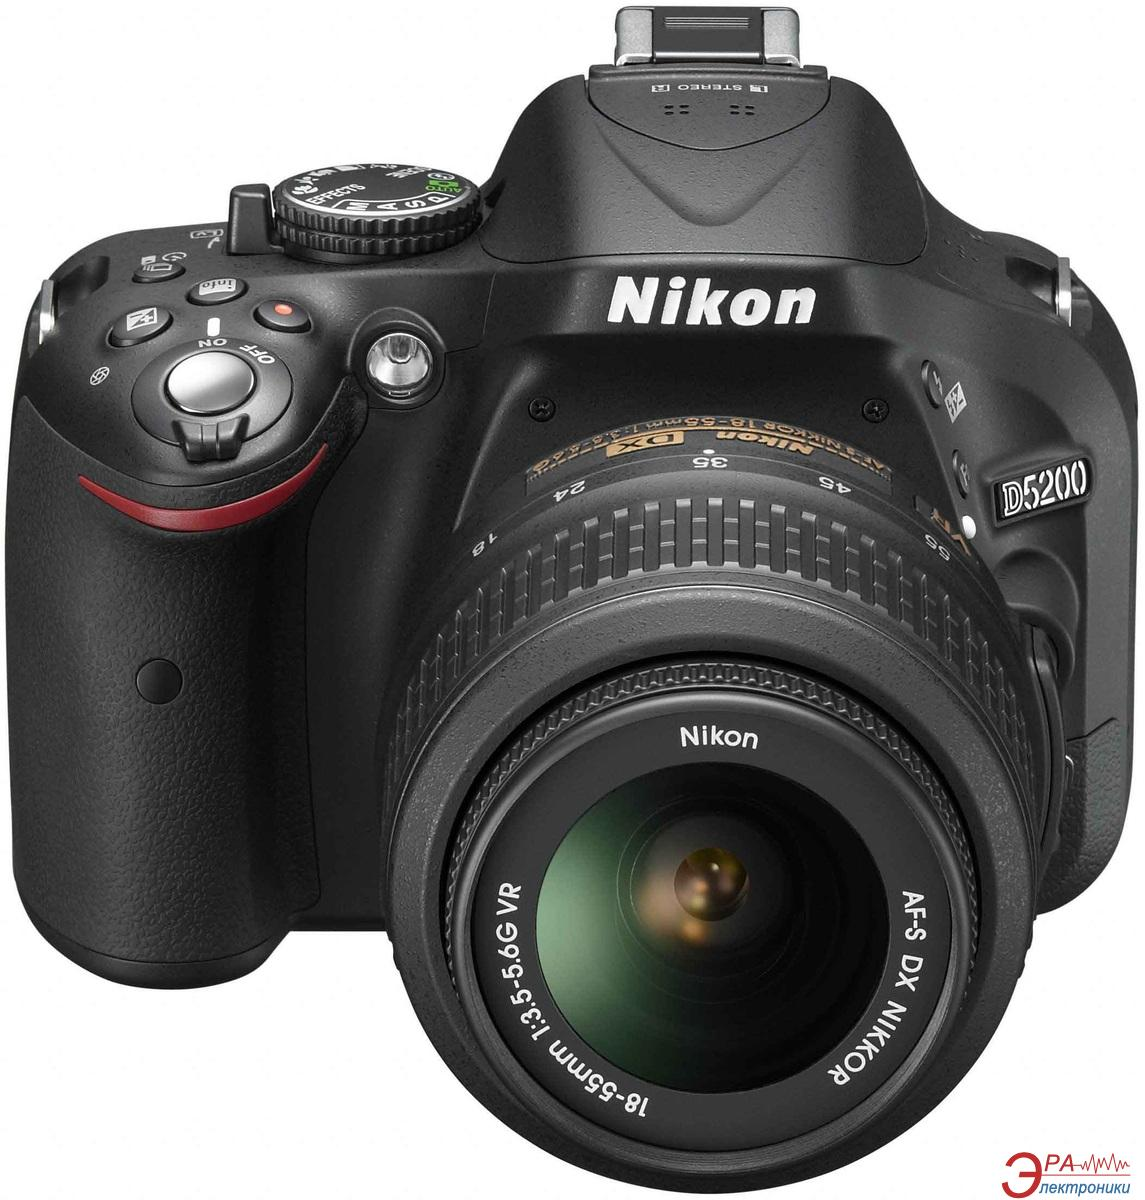 Зеркальная фотокамера Nikon D5200 kit AF-S DX 18-55mm f/3.5-5.6G VR (VBA350K001) Black